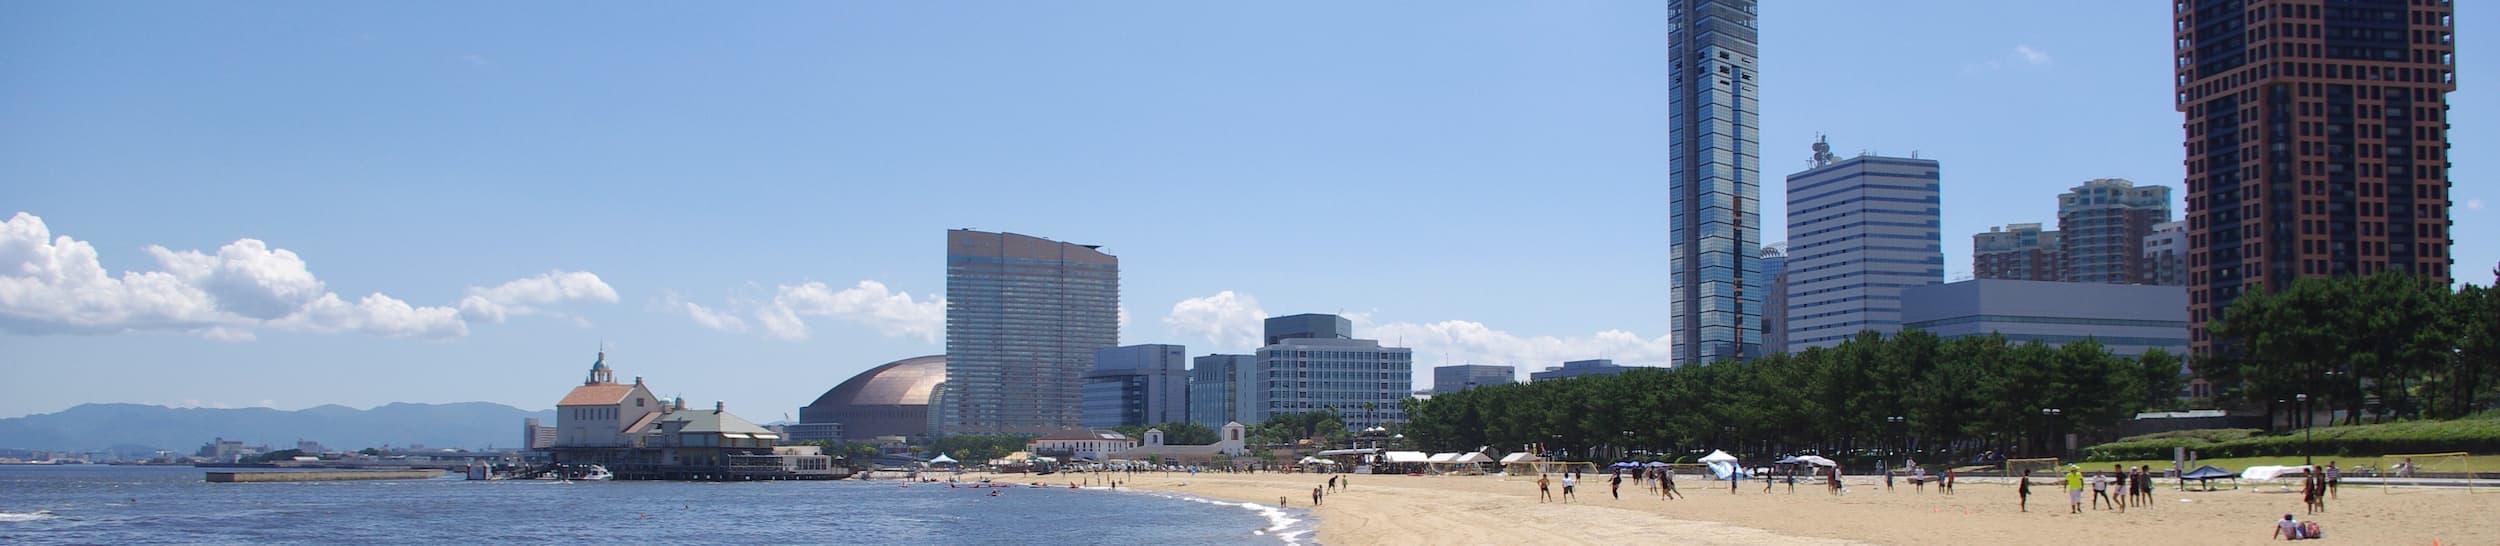 Visa and residency for Fukuoka, Japan - Teleport Cities